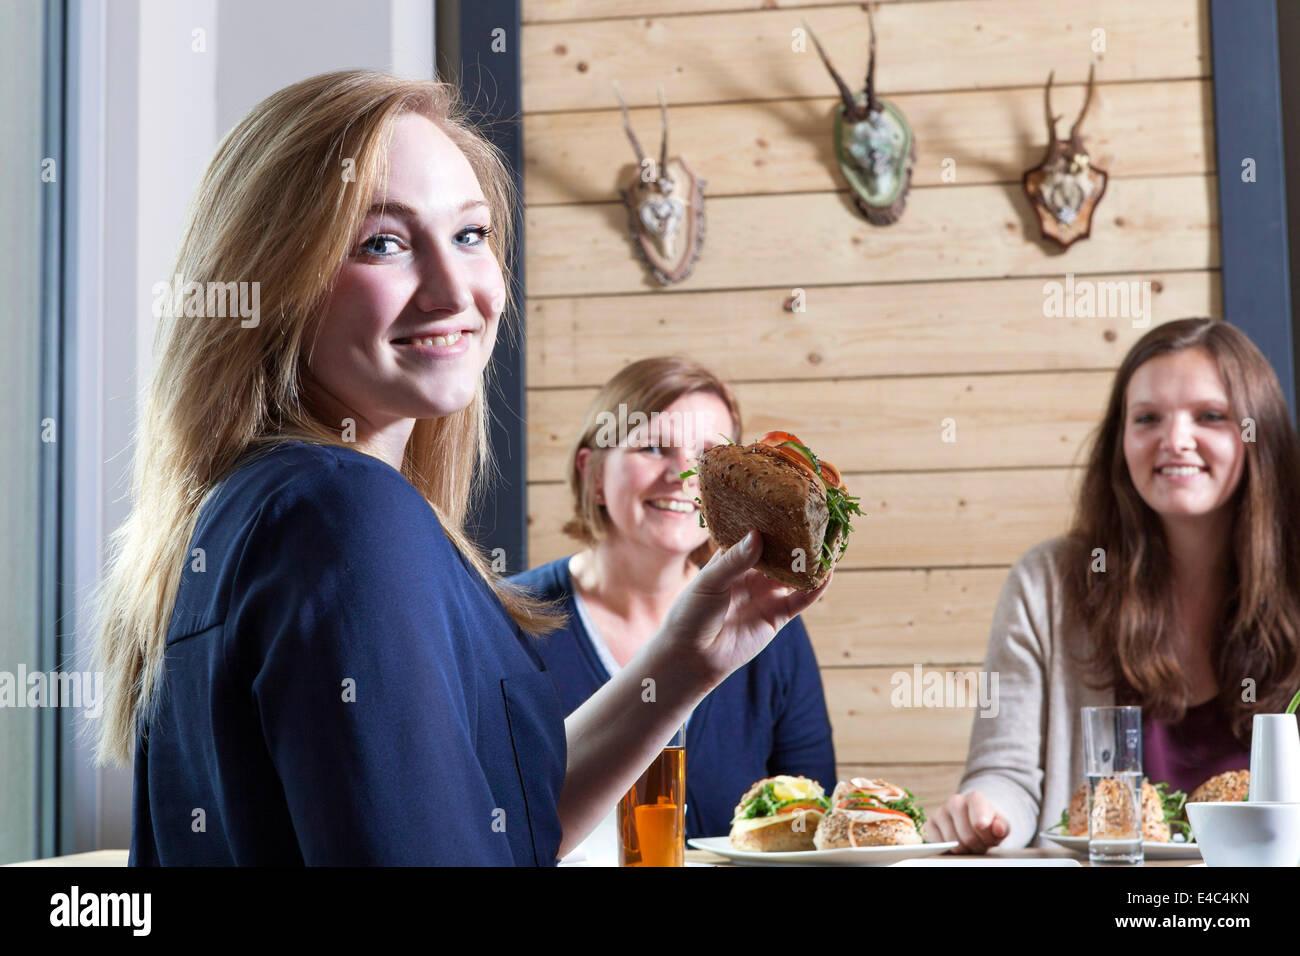 Three women having breakfast in a cafe - Stock Image